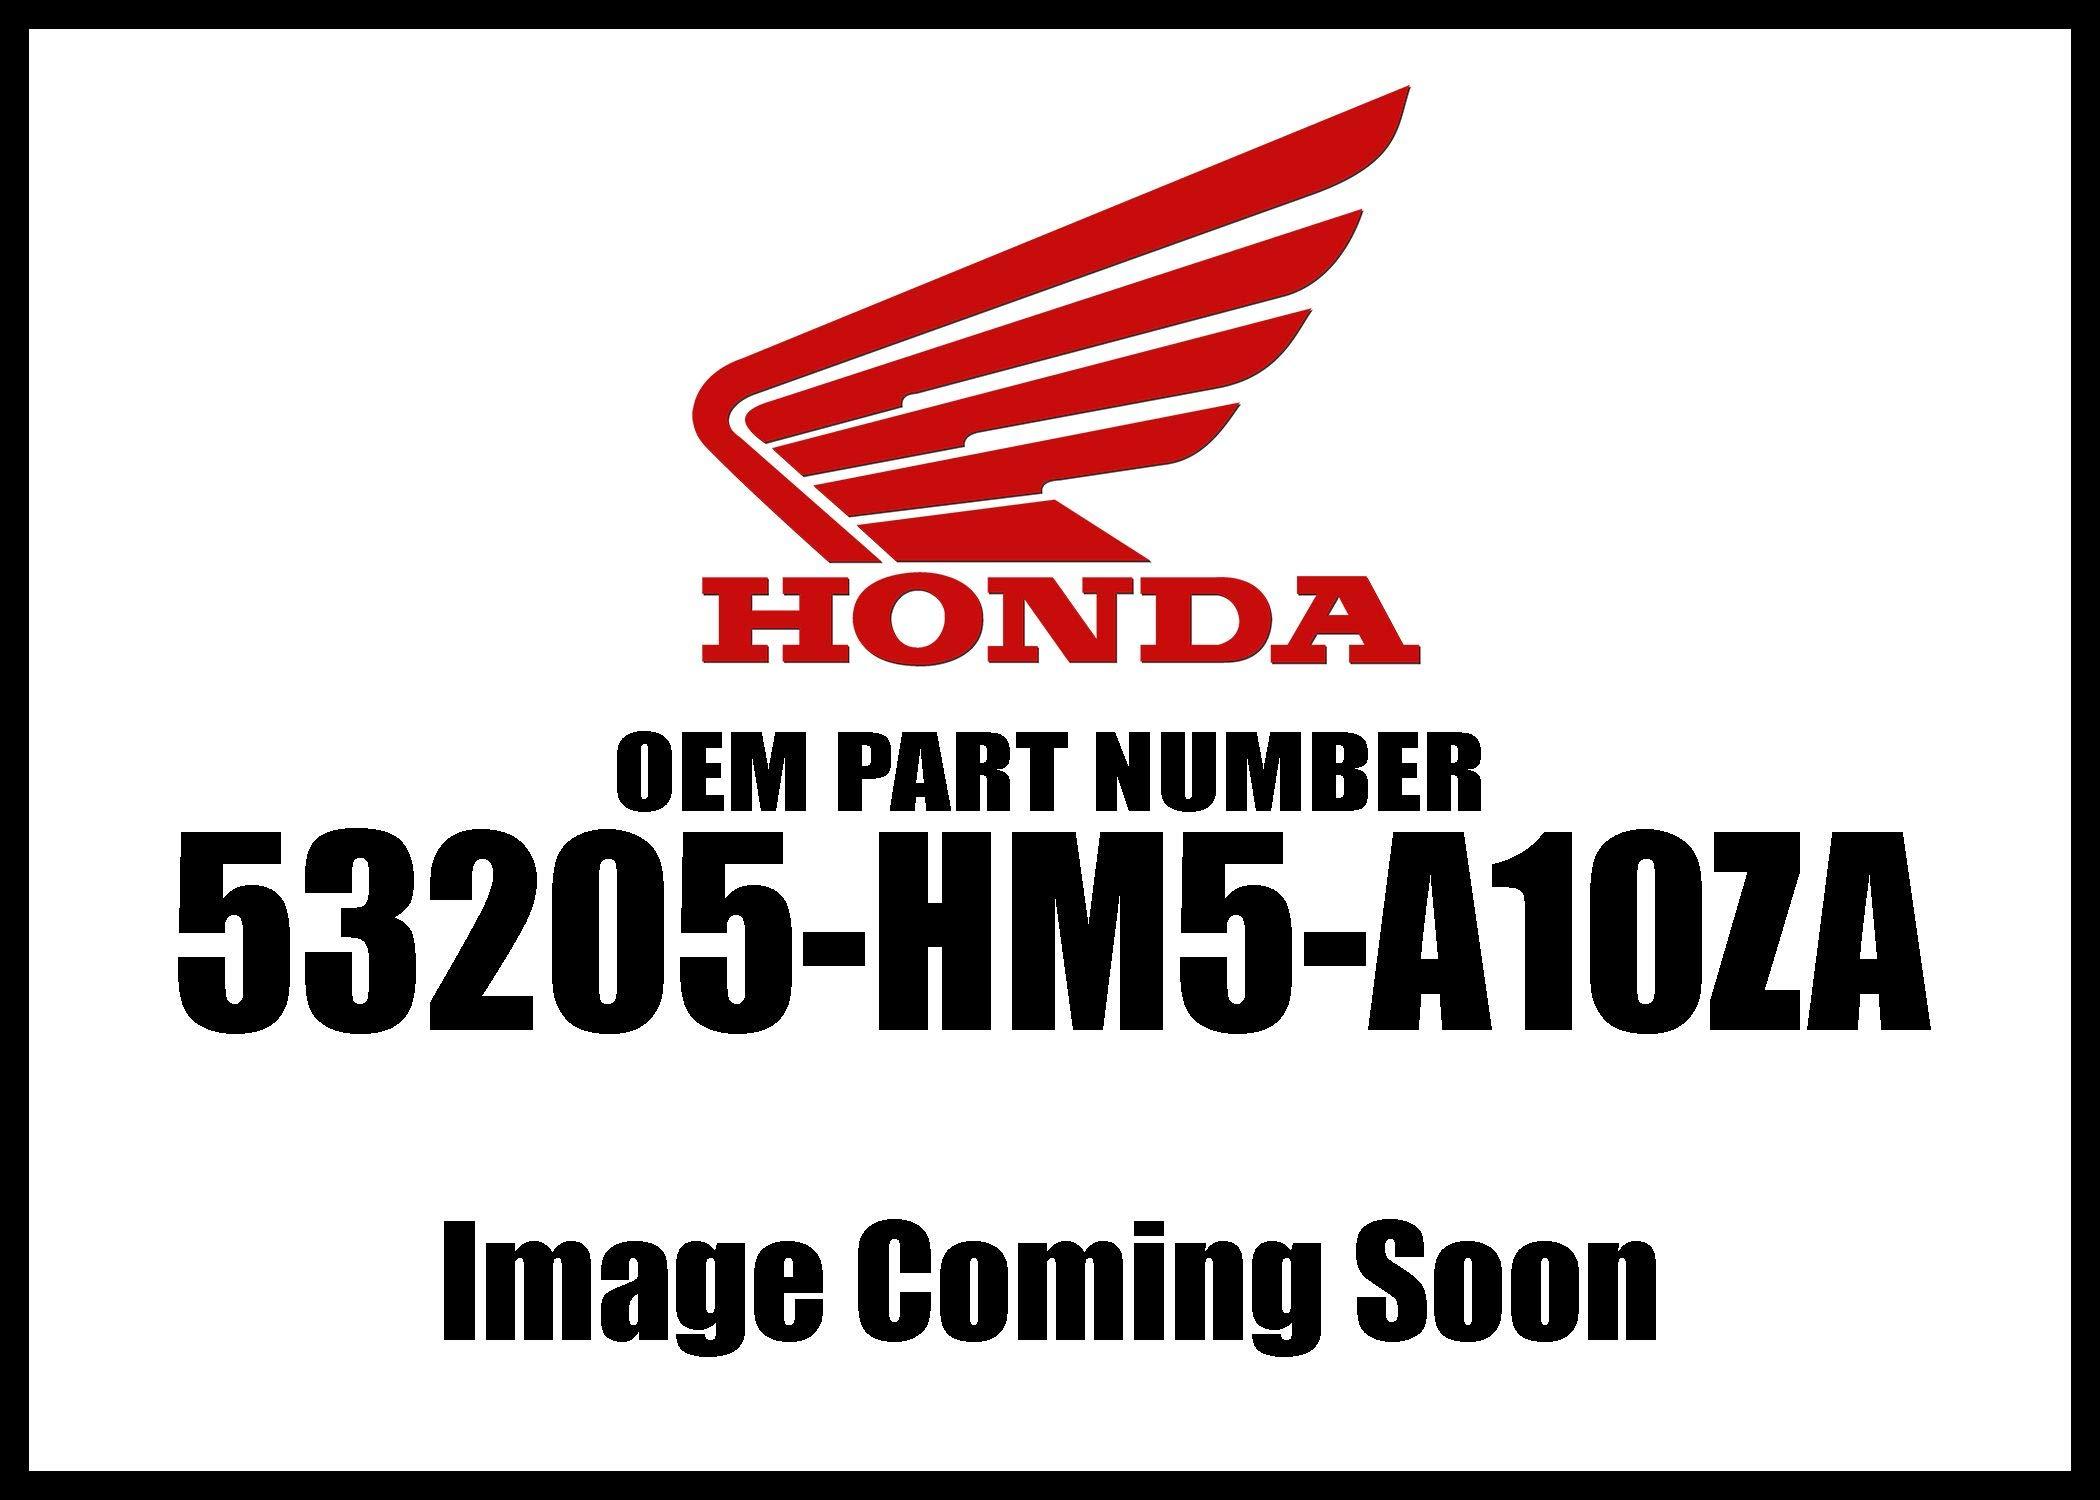 HONDA 53205-HM5-A10ZA CVR, HANDLE (TYPE2)